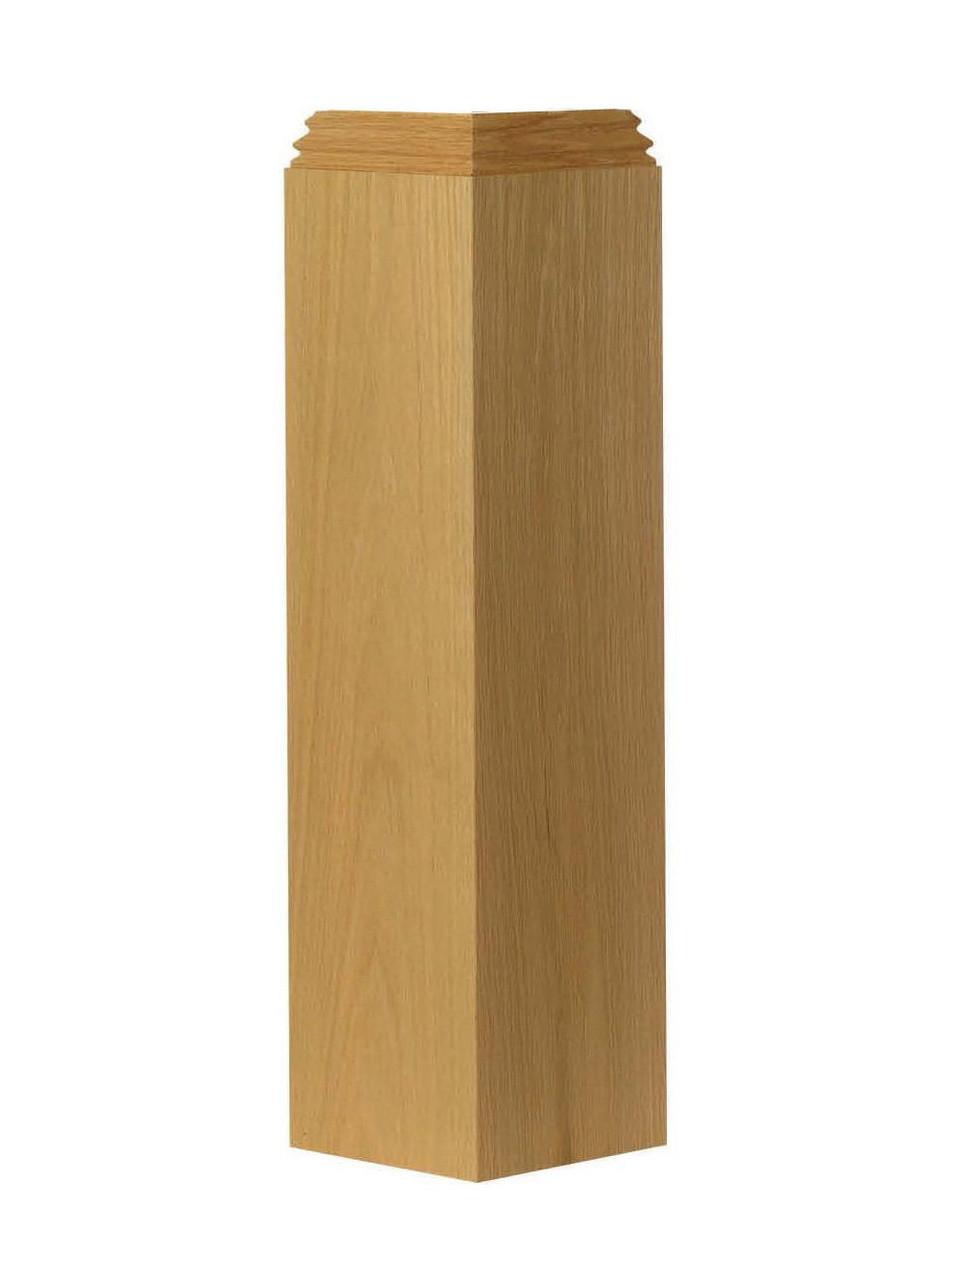 4075 Box Newel Pedestal/Sleeve